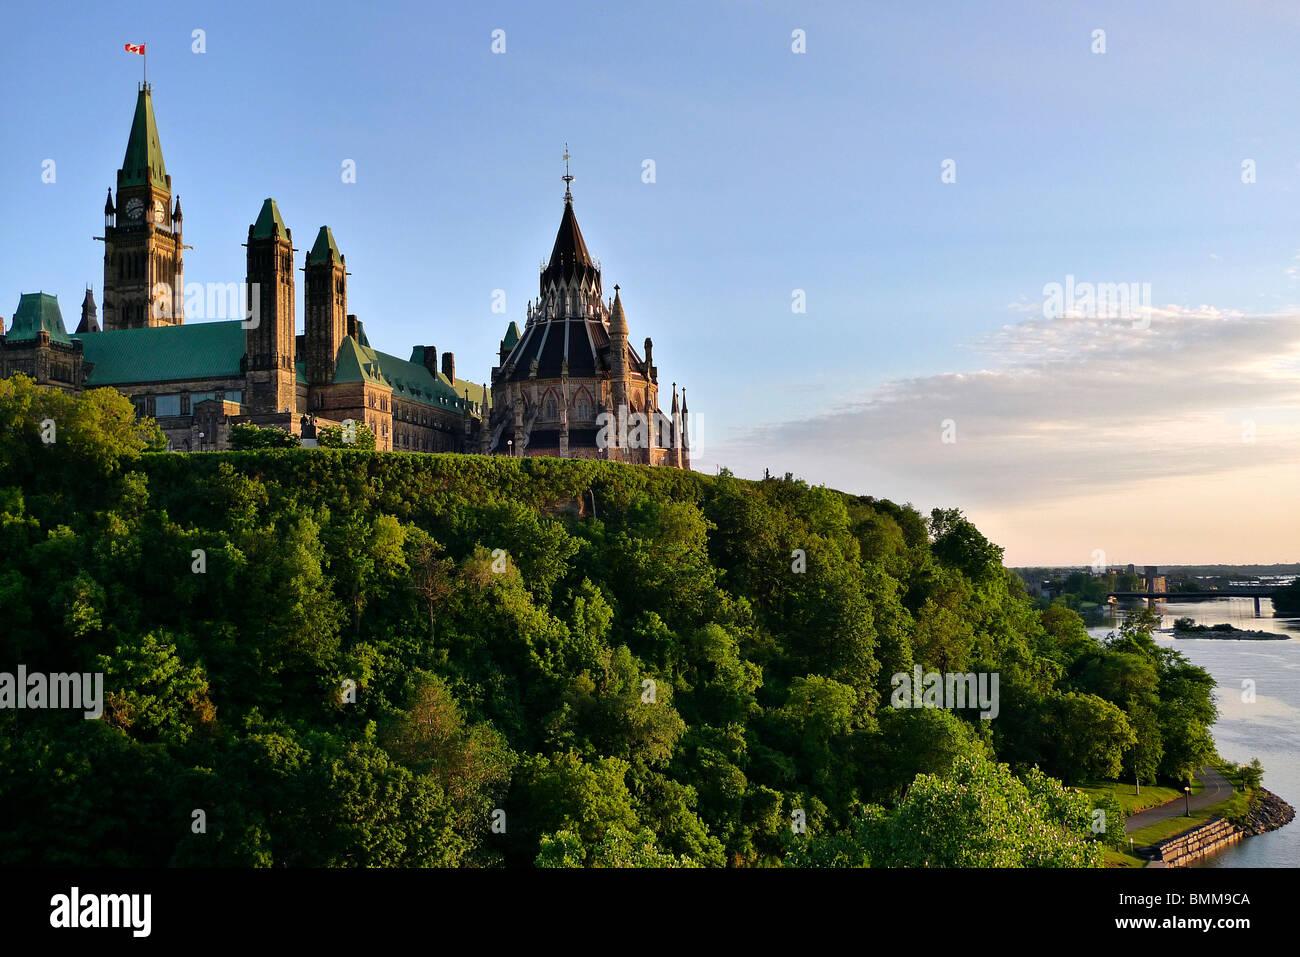 Canadian Parliament Buildings, Ottawa Ontario, Canada. - Stock Image